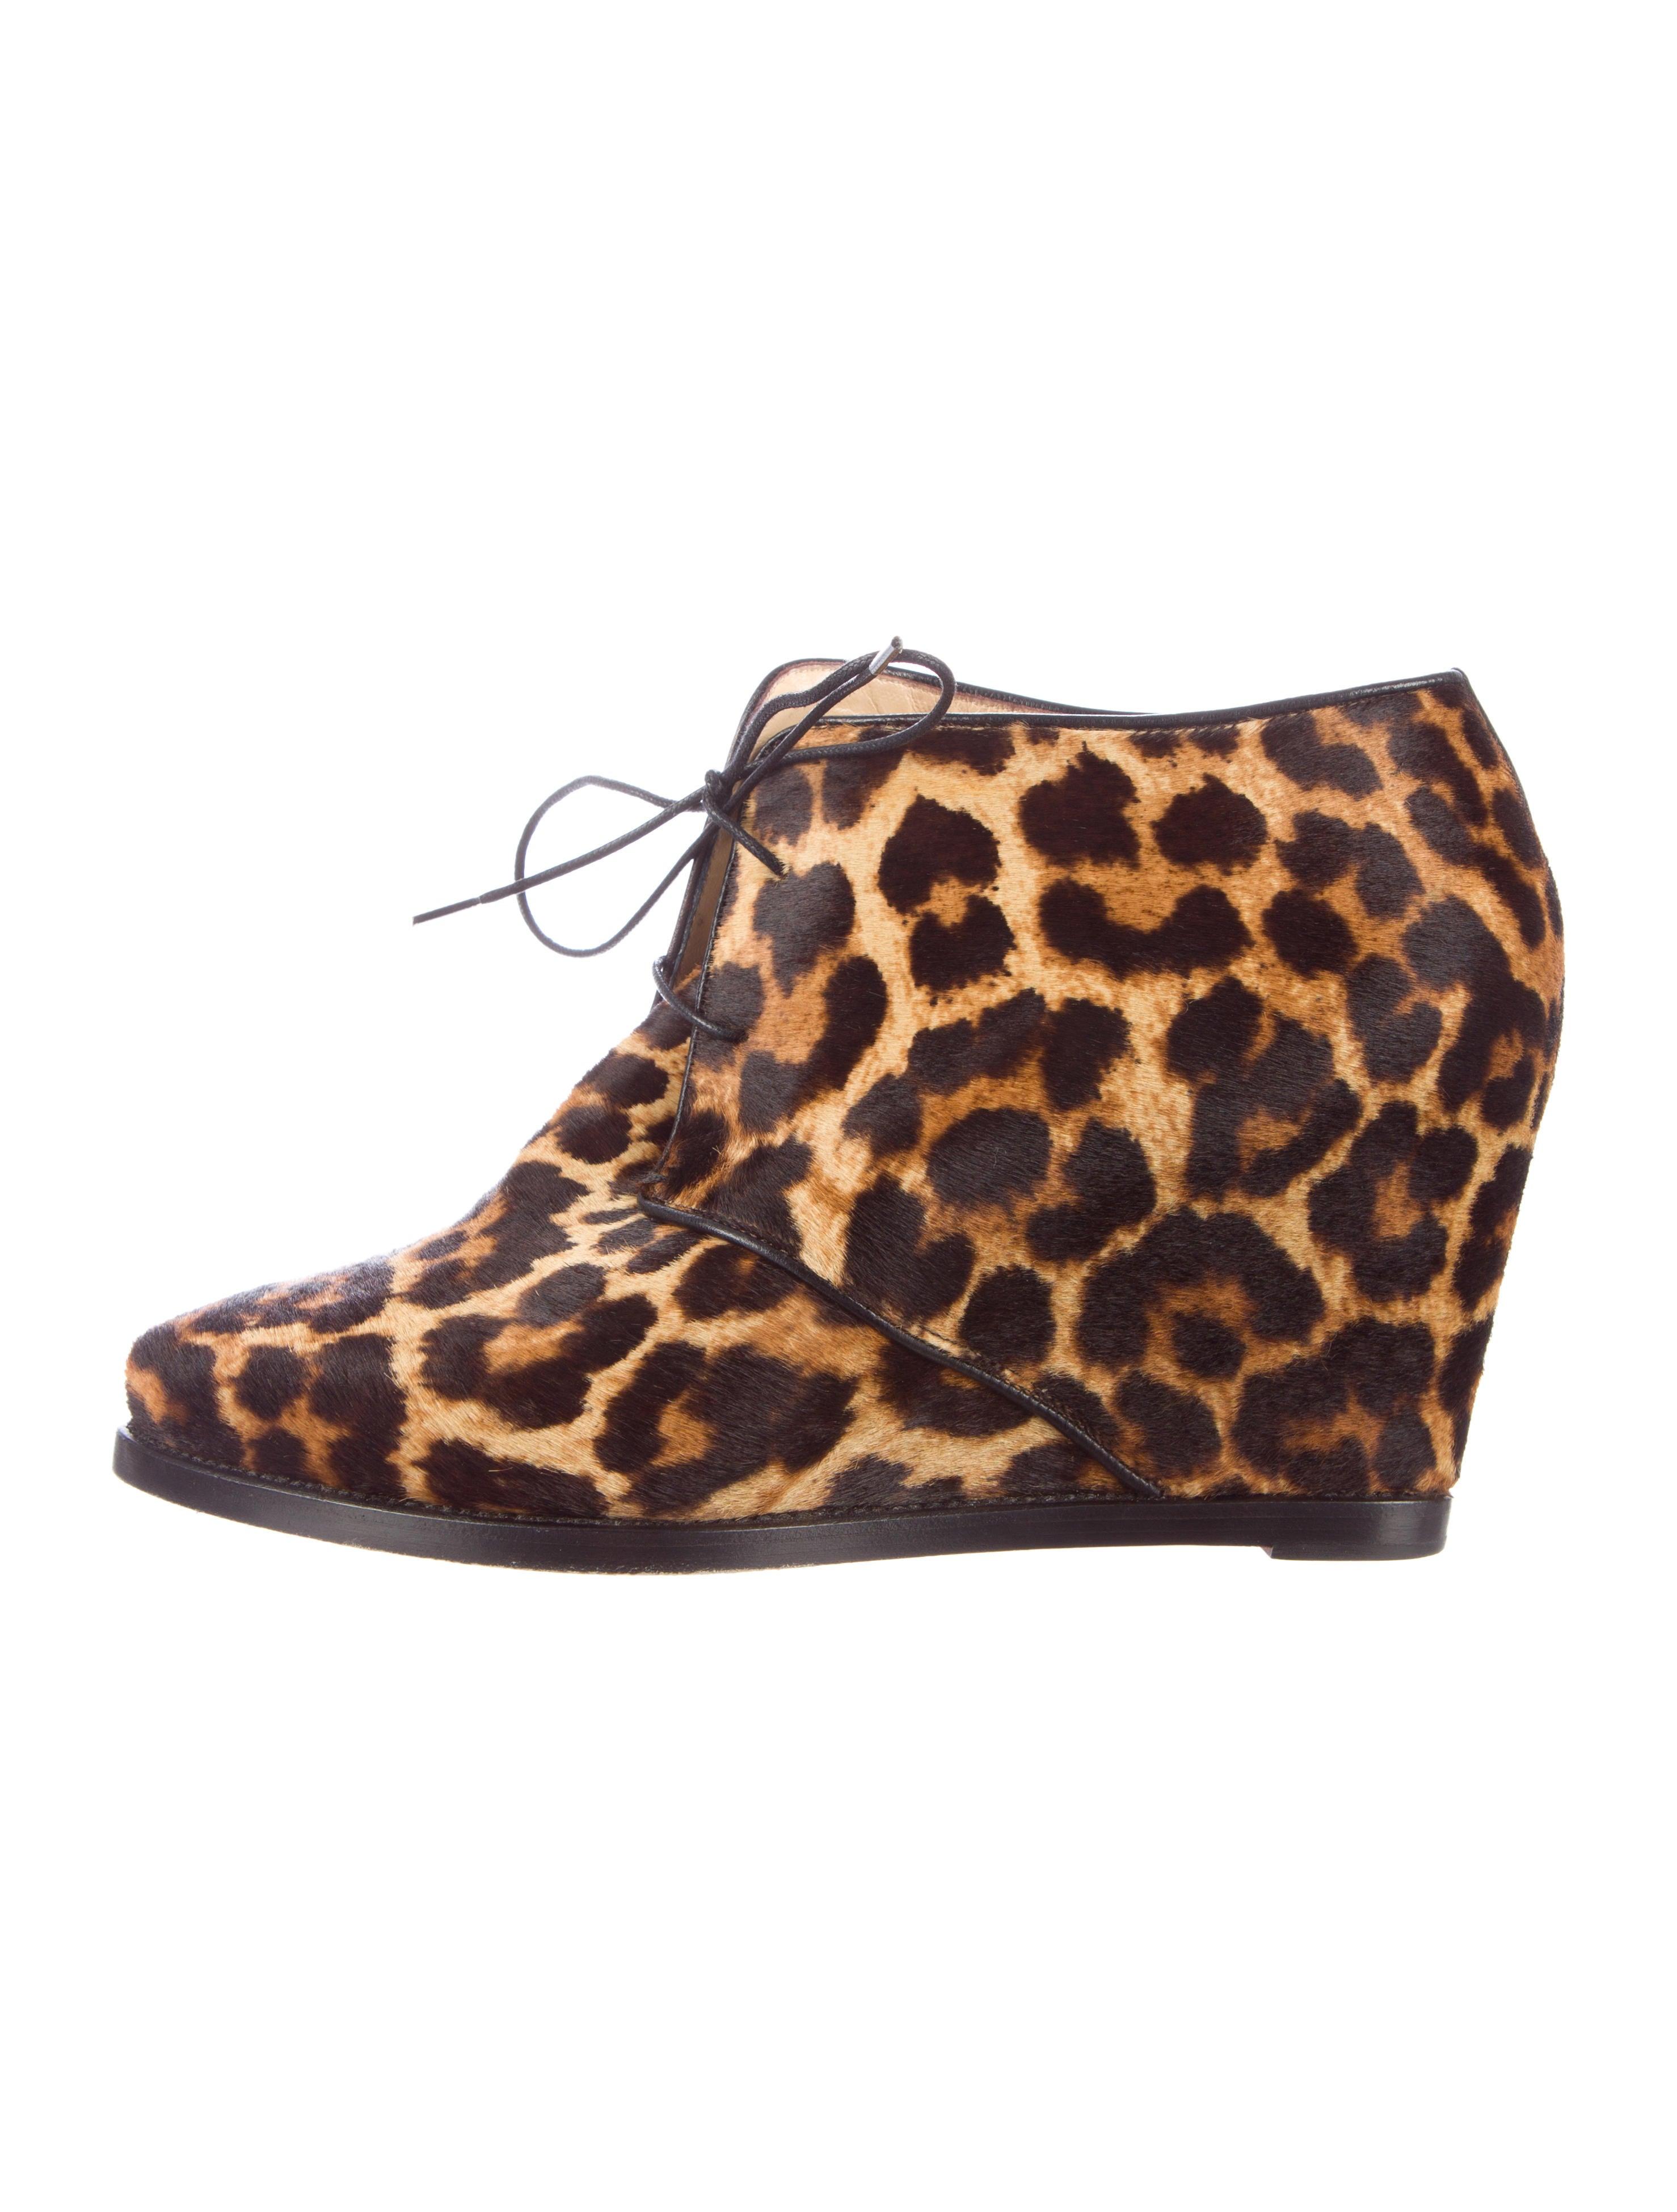 Artesur ? christian louboutin leopard print Lady Schuss wedges ...